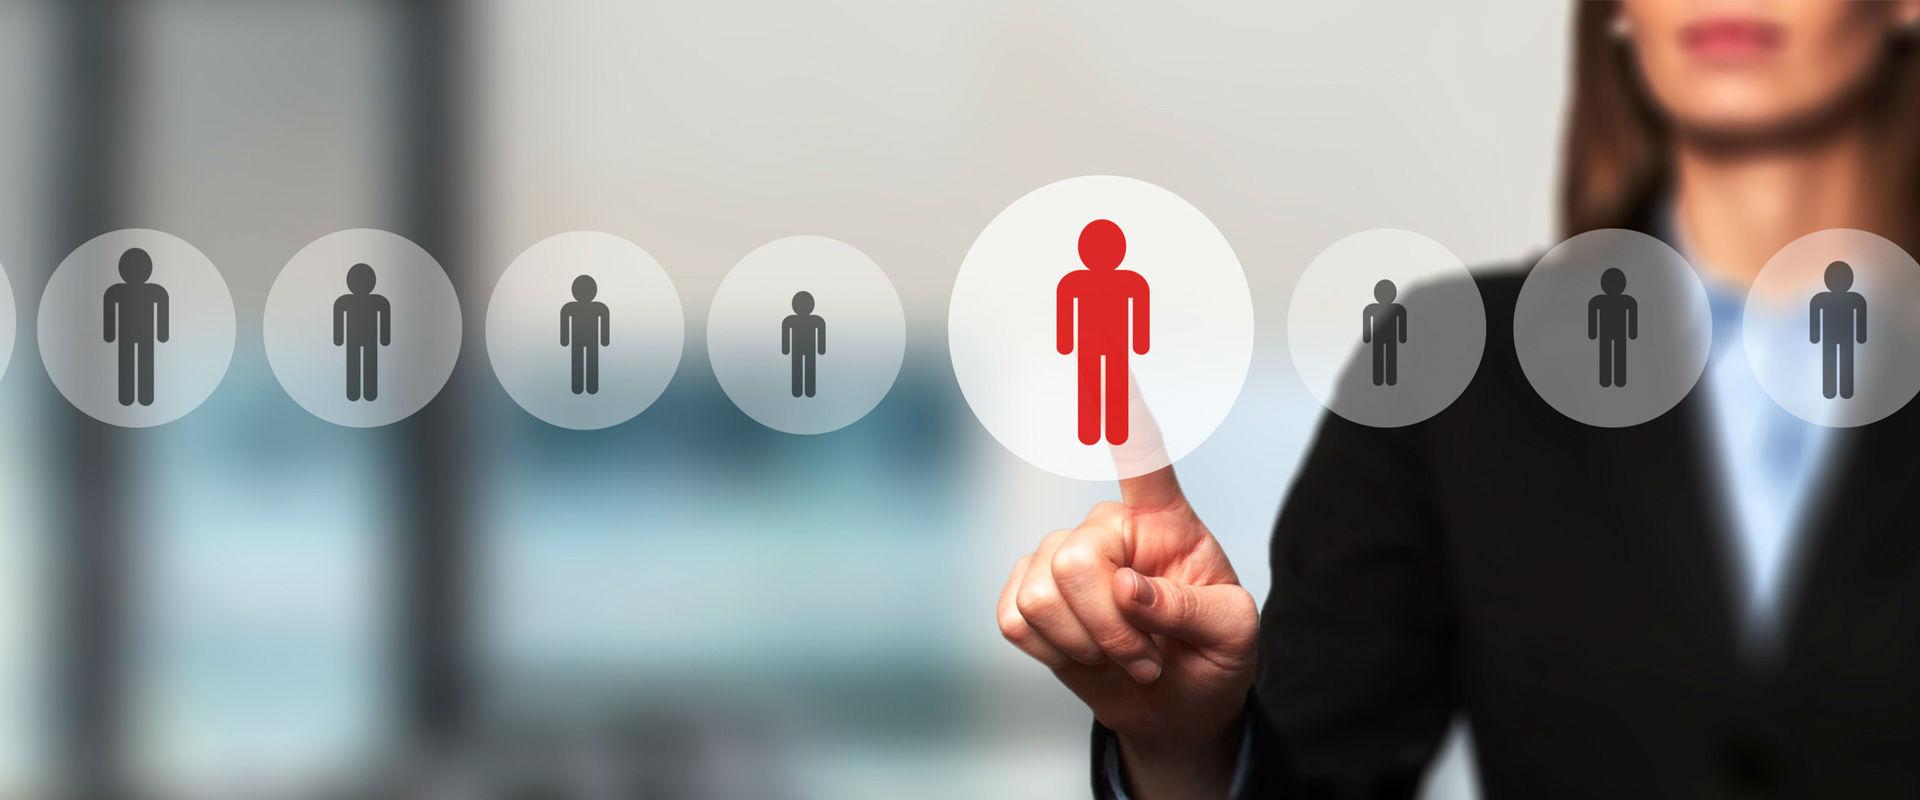 Služba za zapošljavanje BPK - Nova prilika za nezaposlene osobe